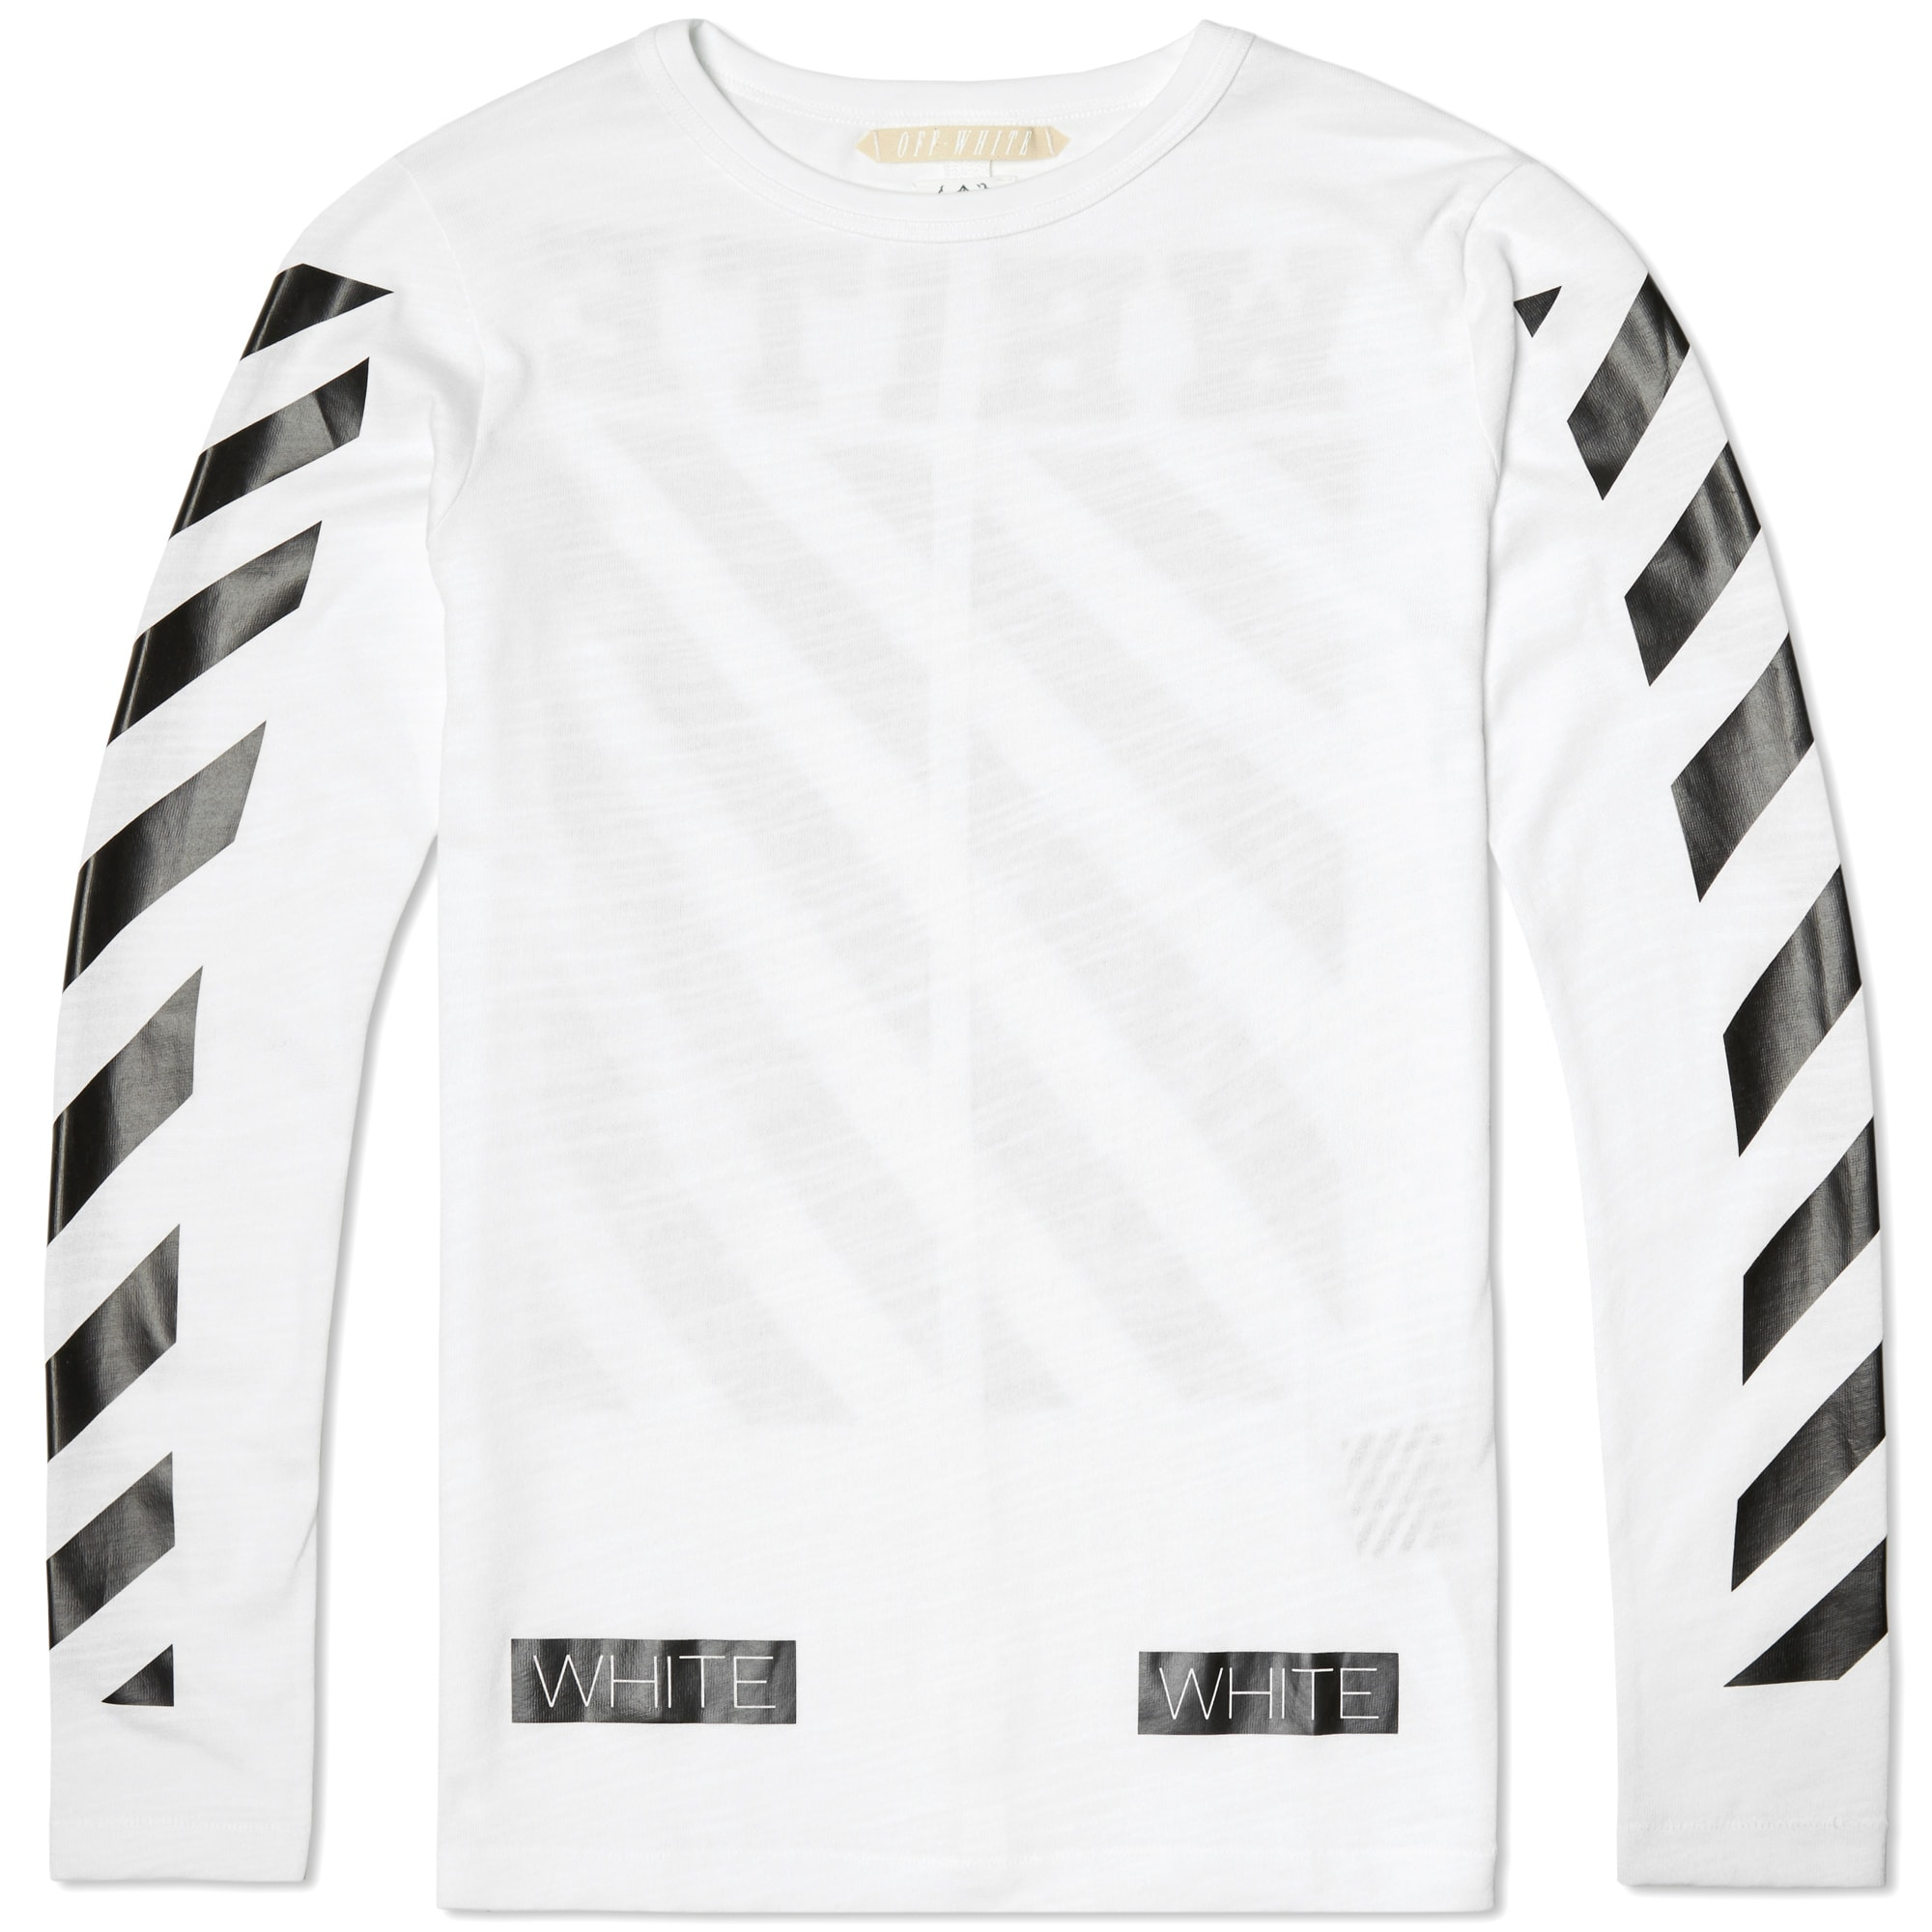 c86ded3d4 Off White T Shirt Long Sleeve - raveitsafe